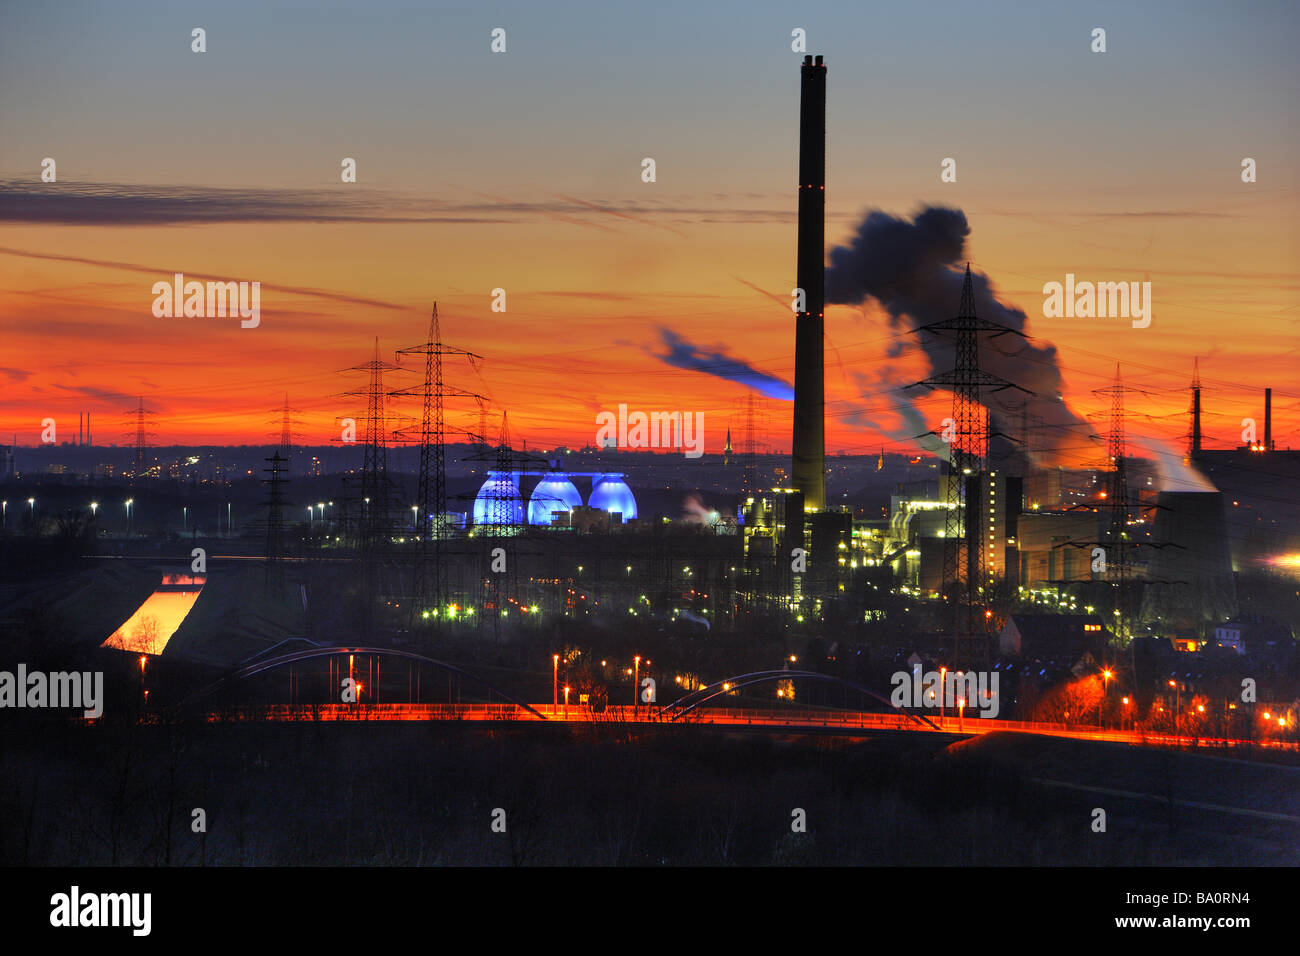 Emscher purification plant Bottrop. Waste incineration plant Essen Karnap of RWE Power AG Essen, Ruhr Area, Germany - Stock Image